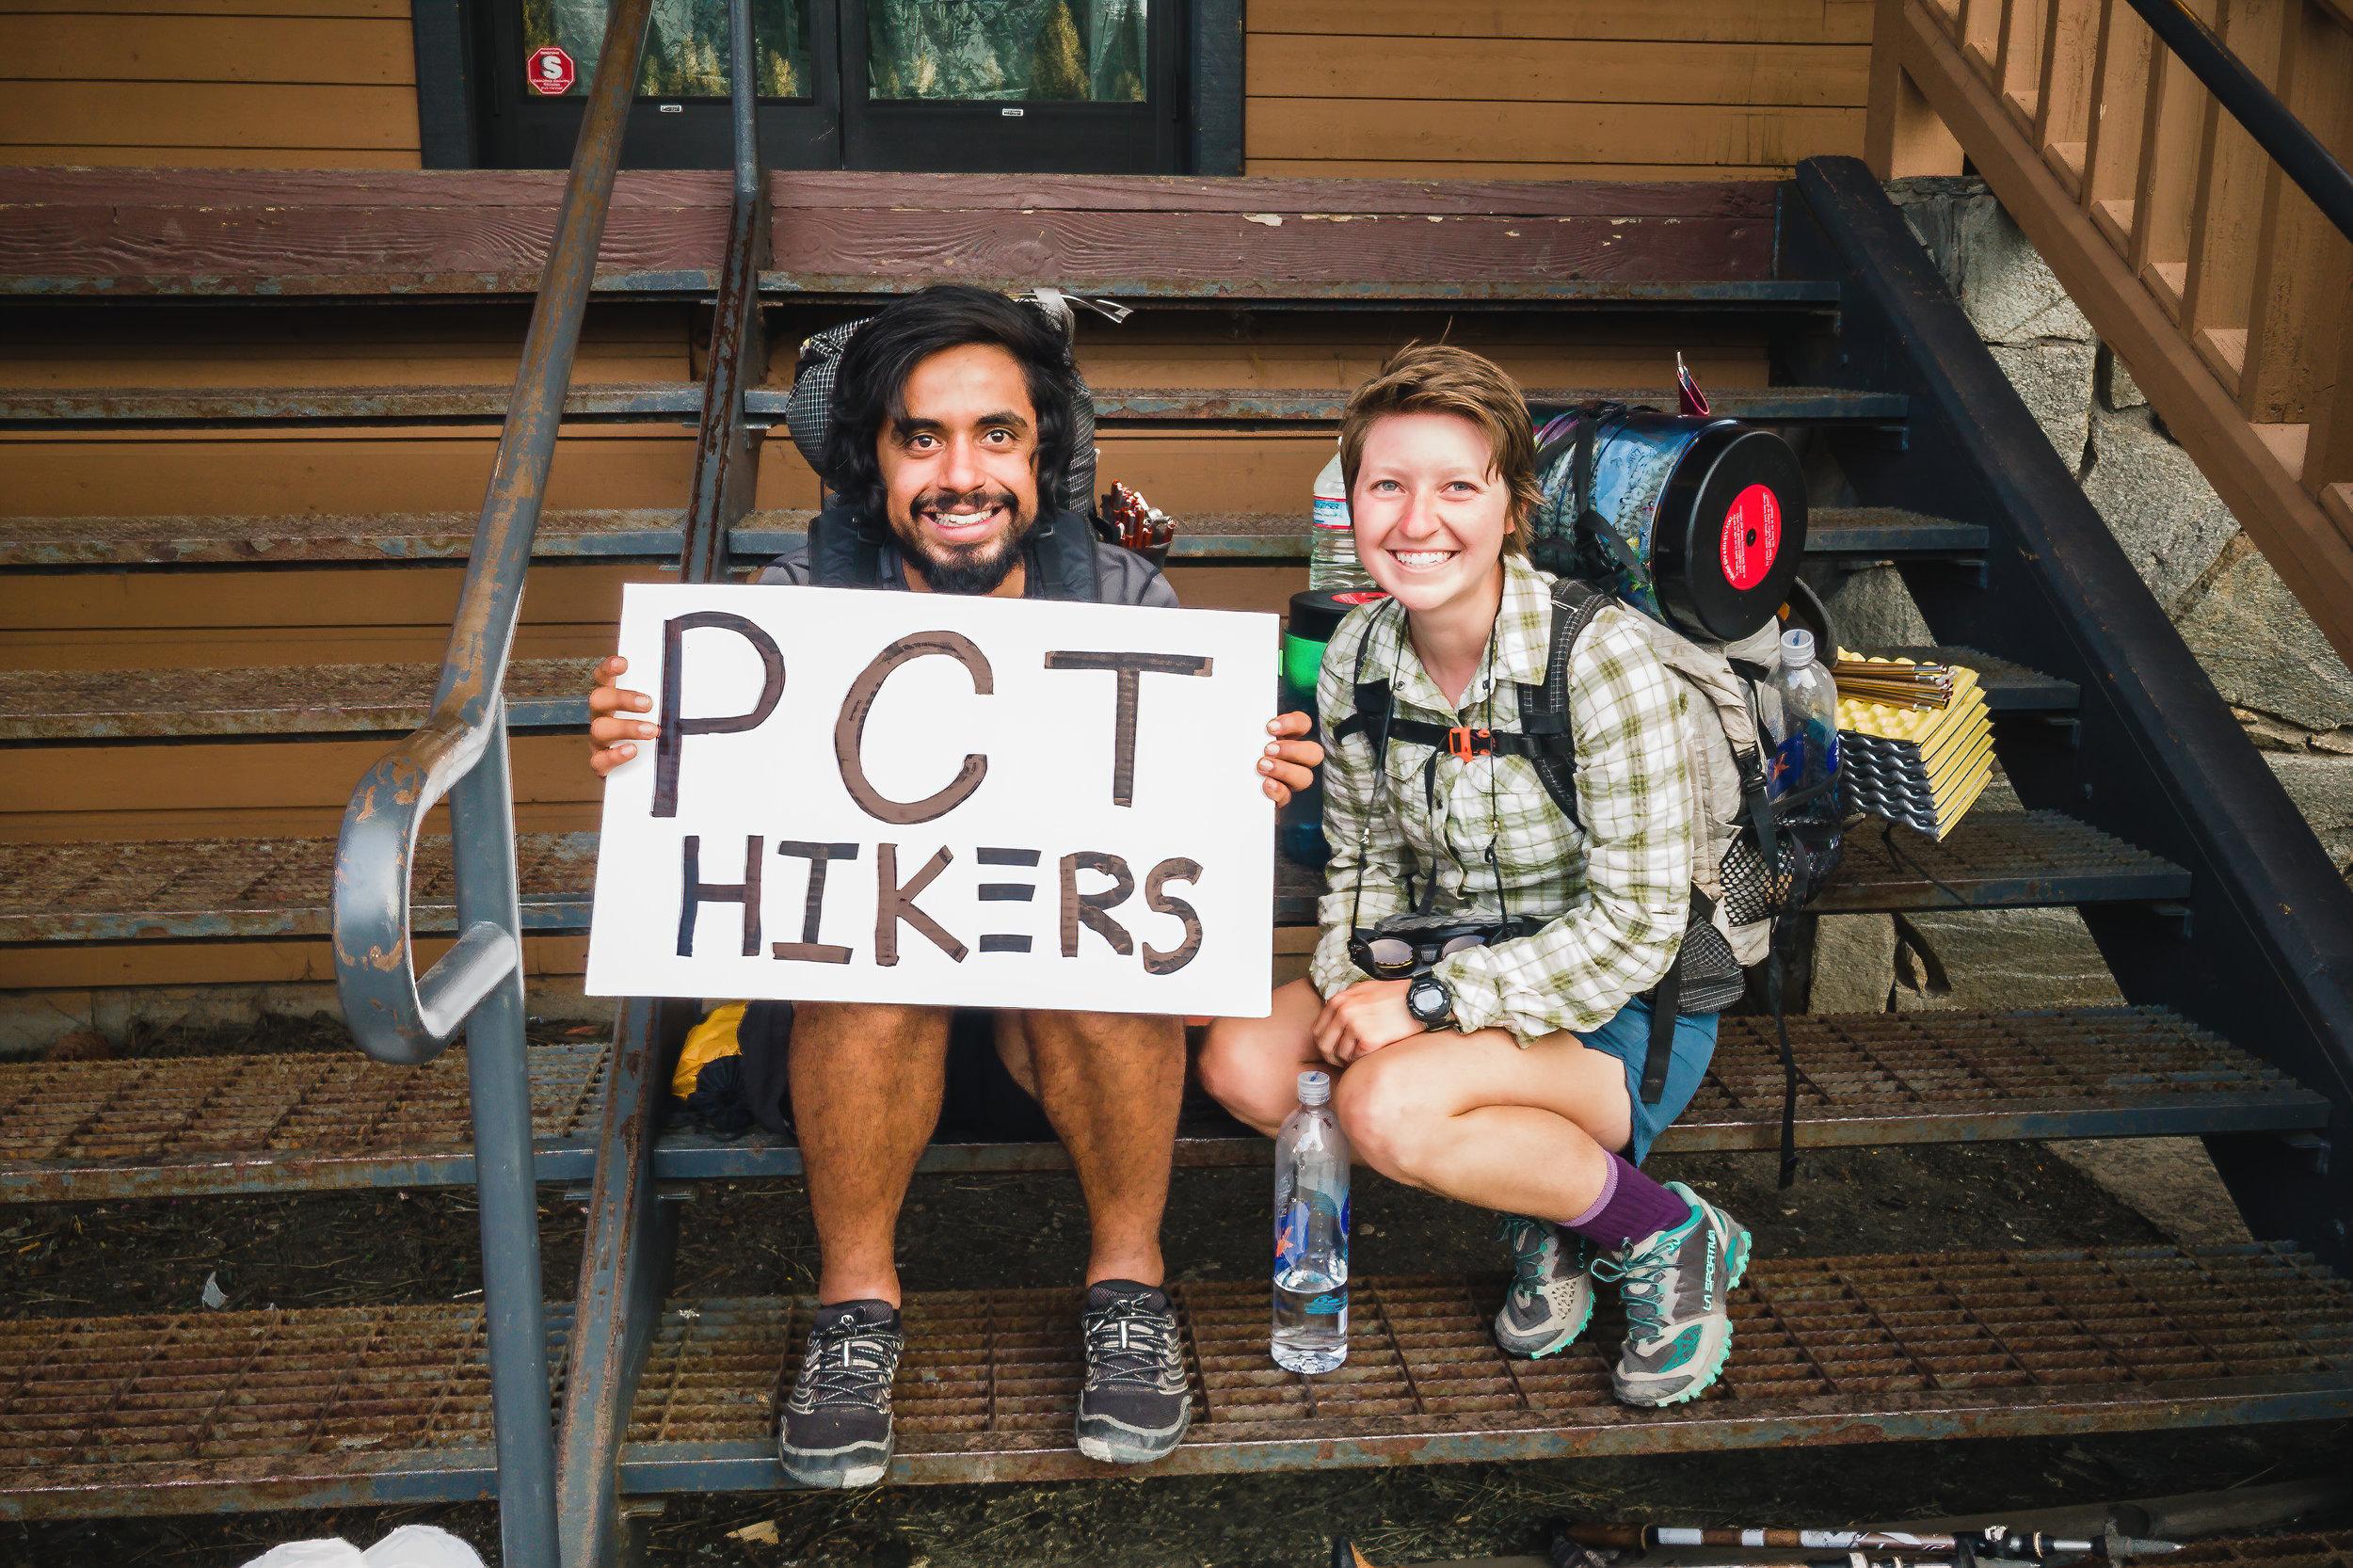 pct-hikers-mammoth.jpg